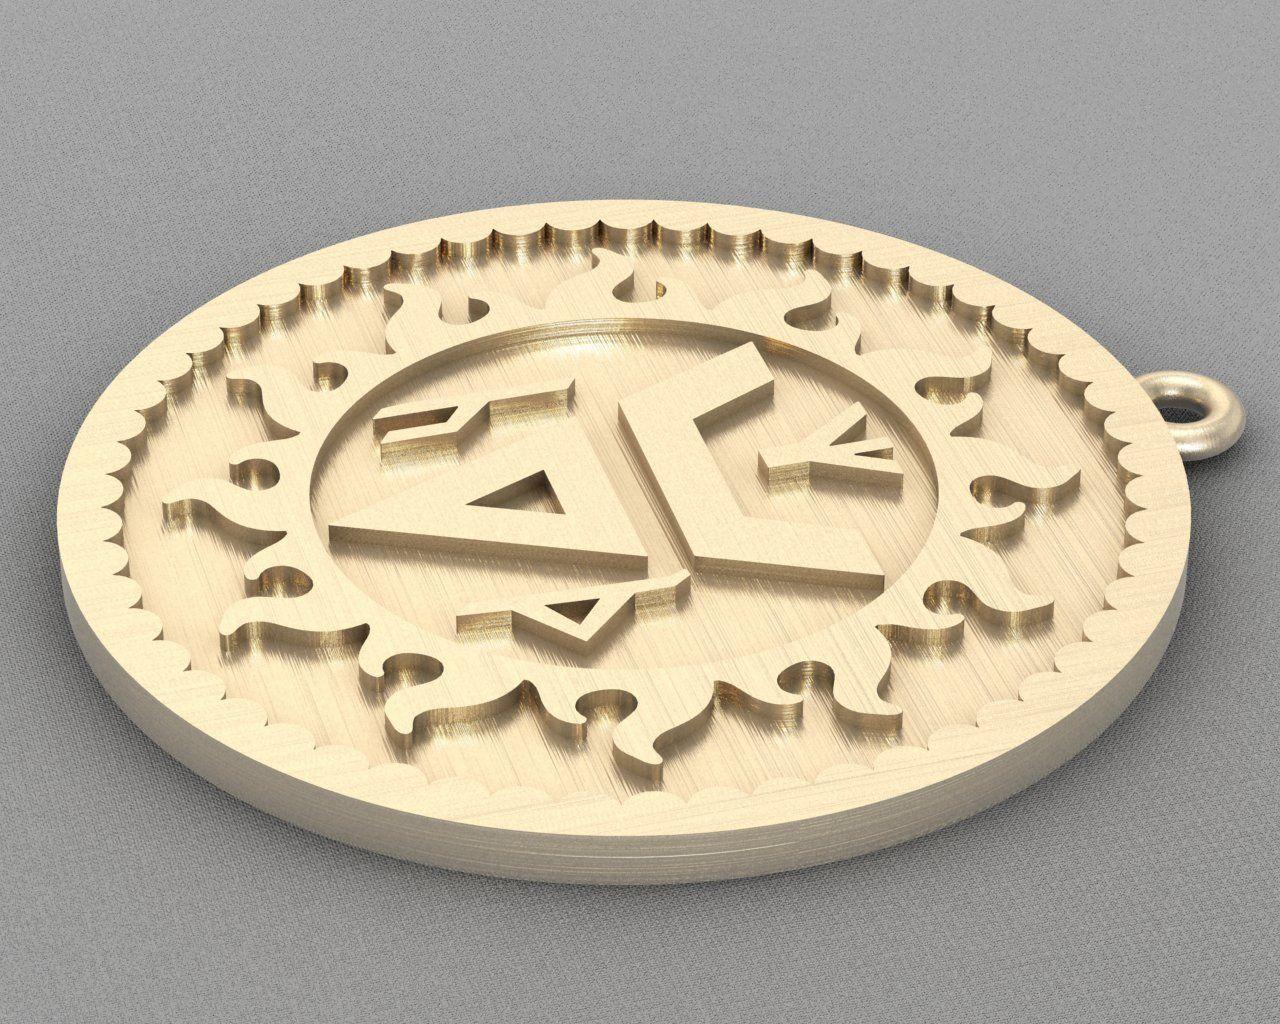 Pendant rune A